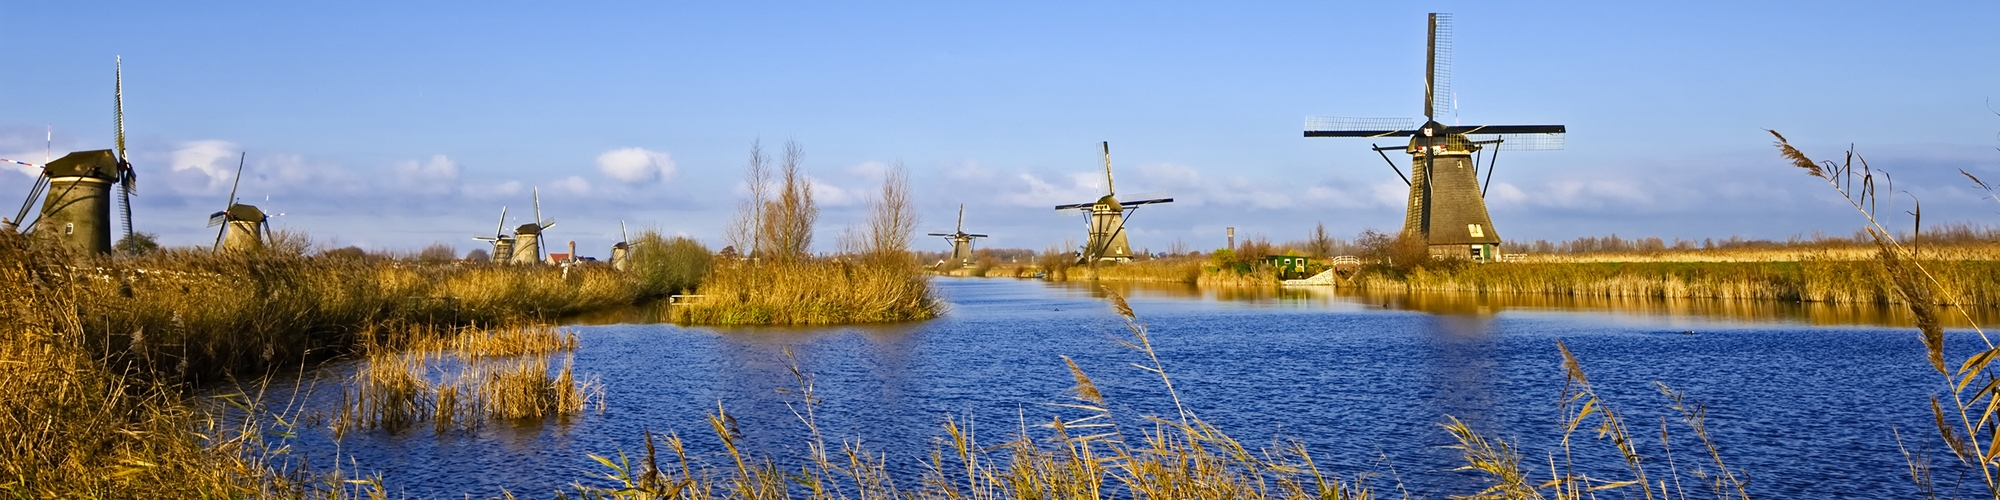 Dutch business spirit